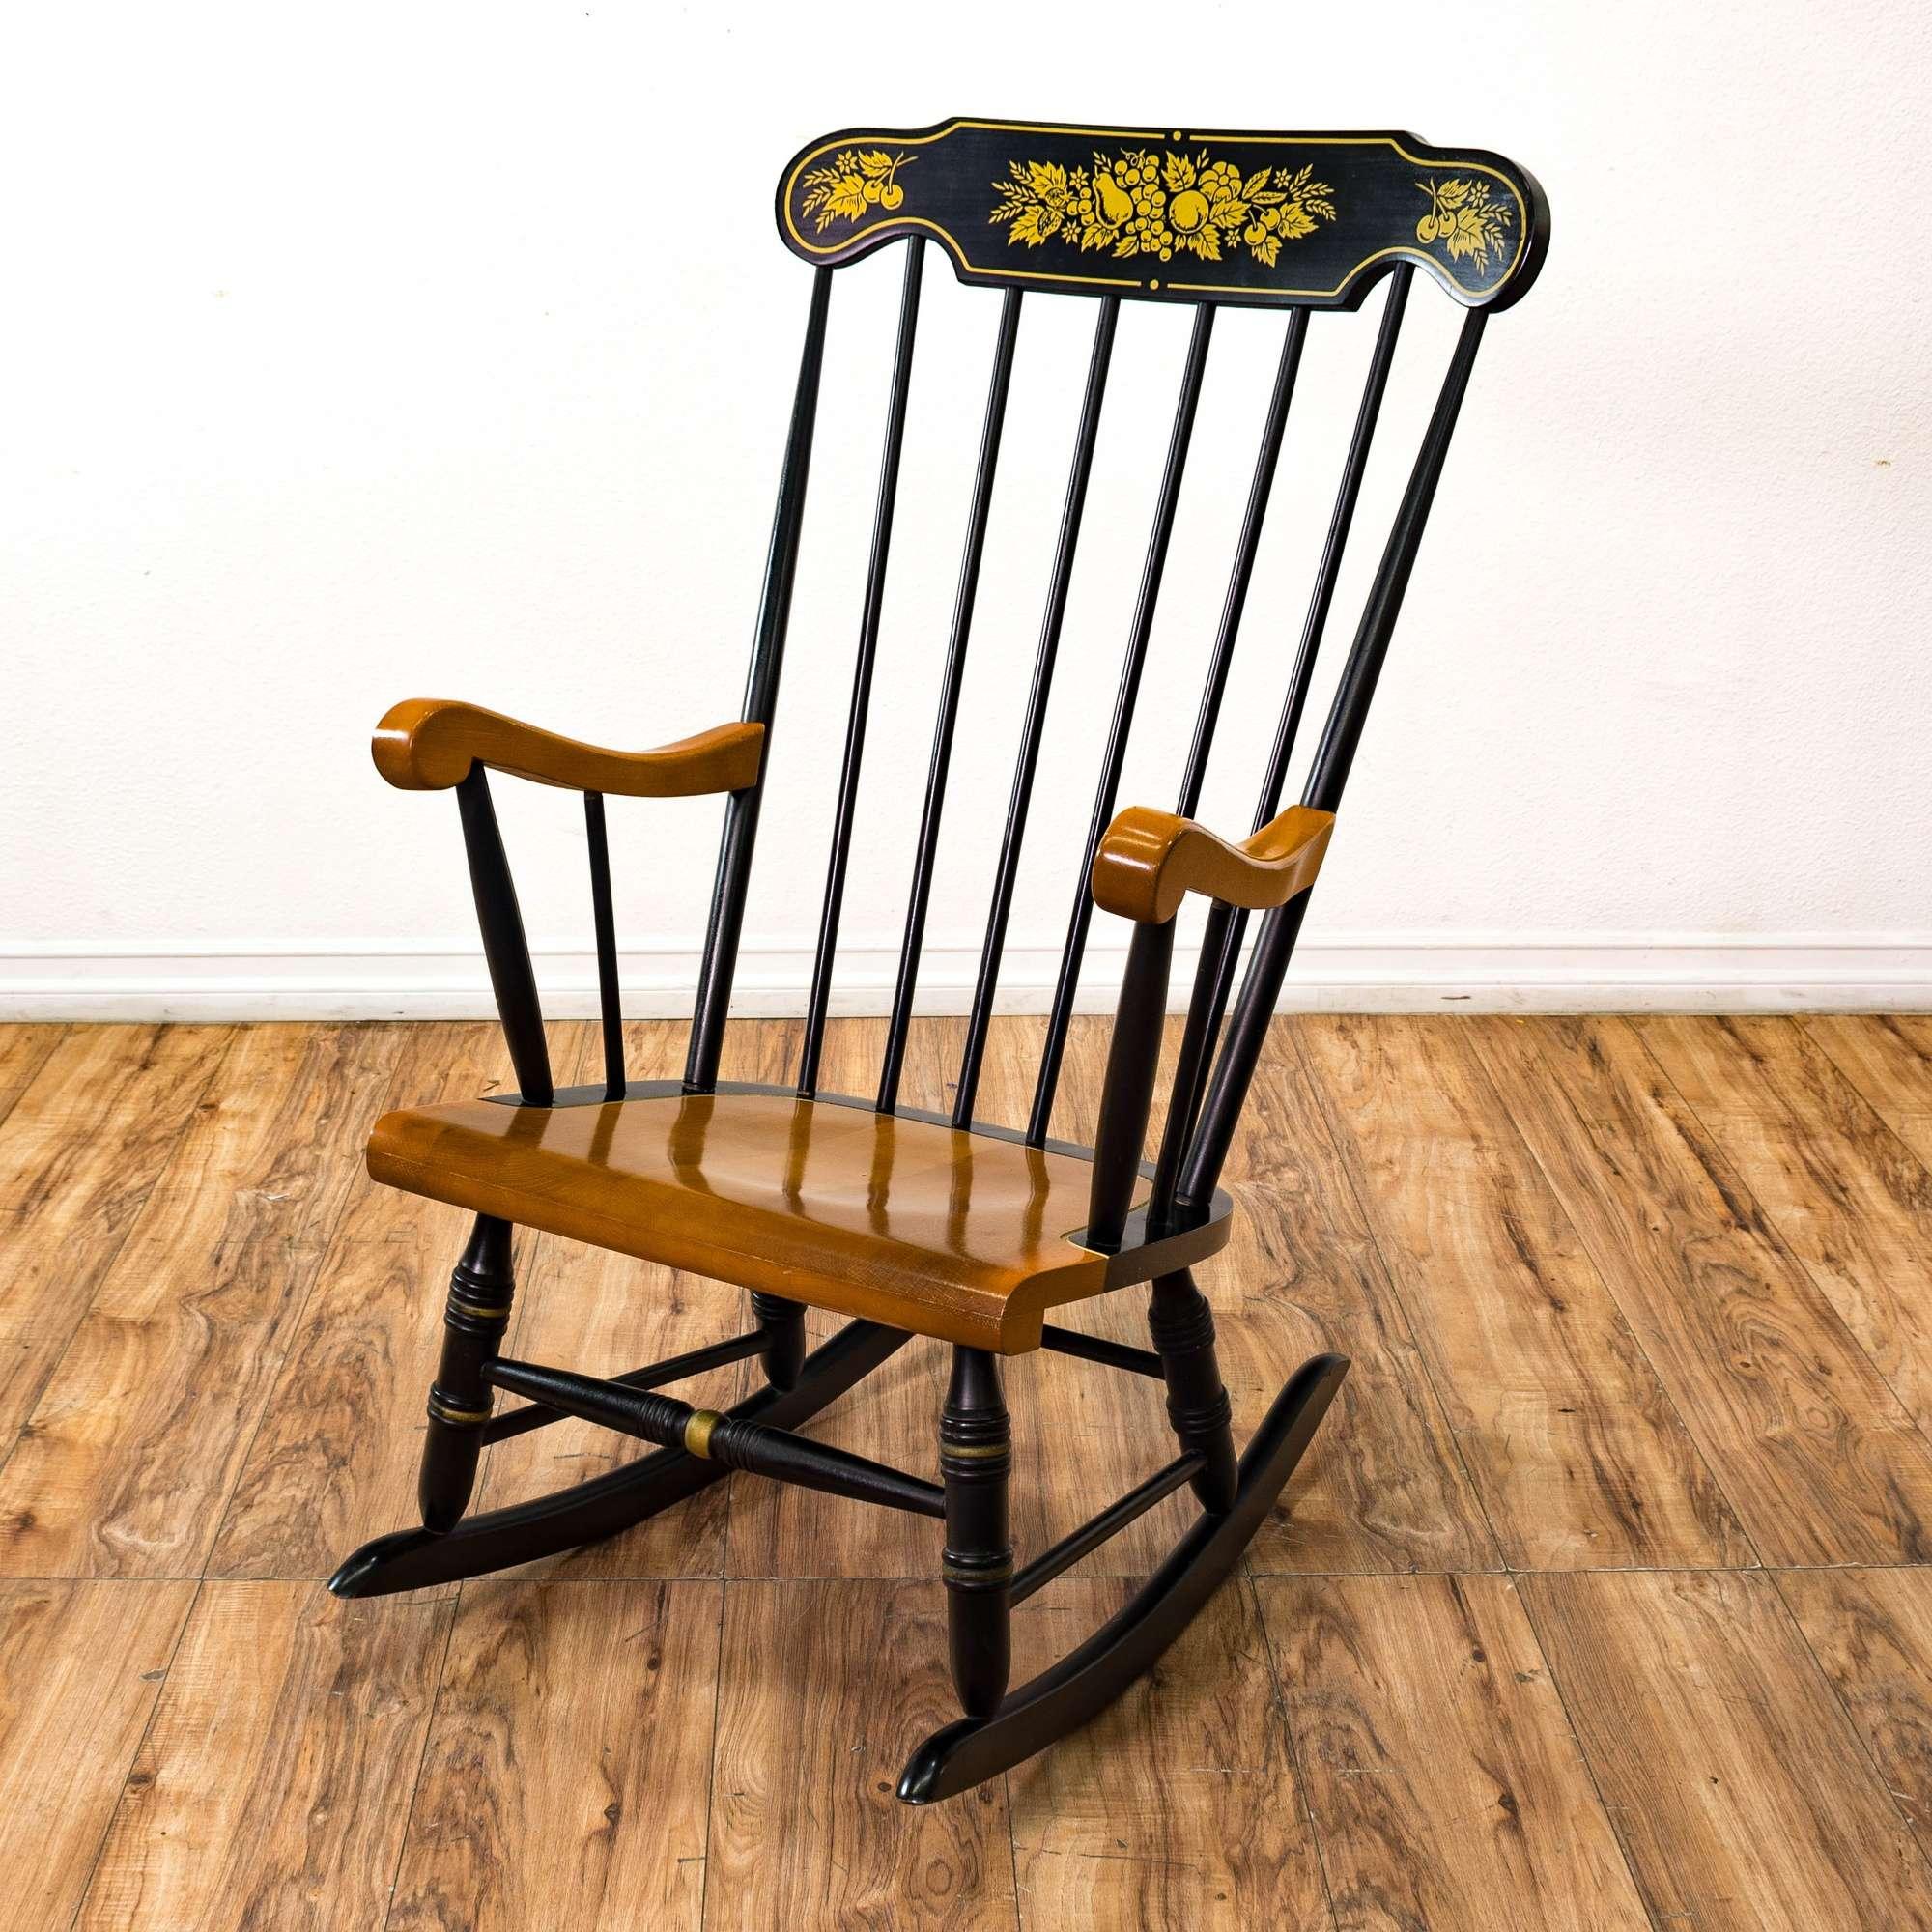 Strange Black Wood Rocking Chair W Gold Stencil Loveseat Ncnpc Chair Design For Home Ncnpcorg